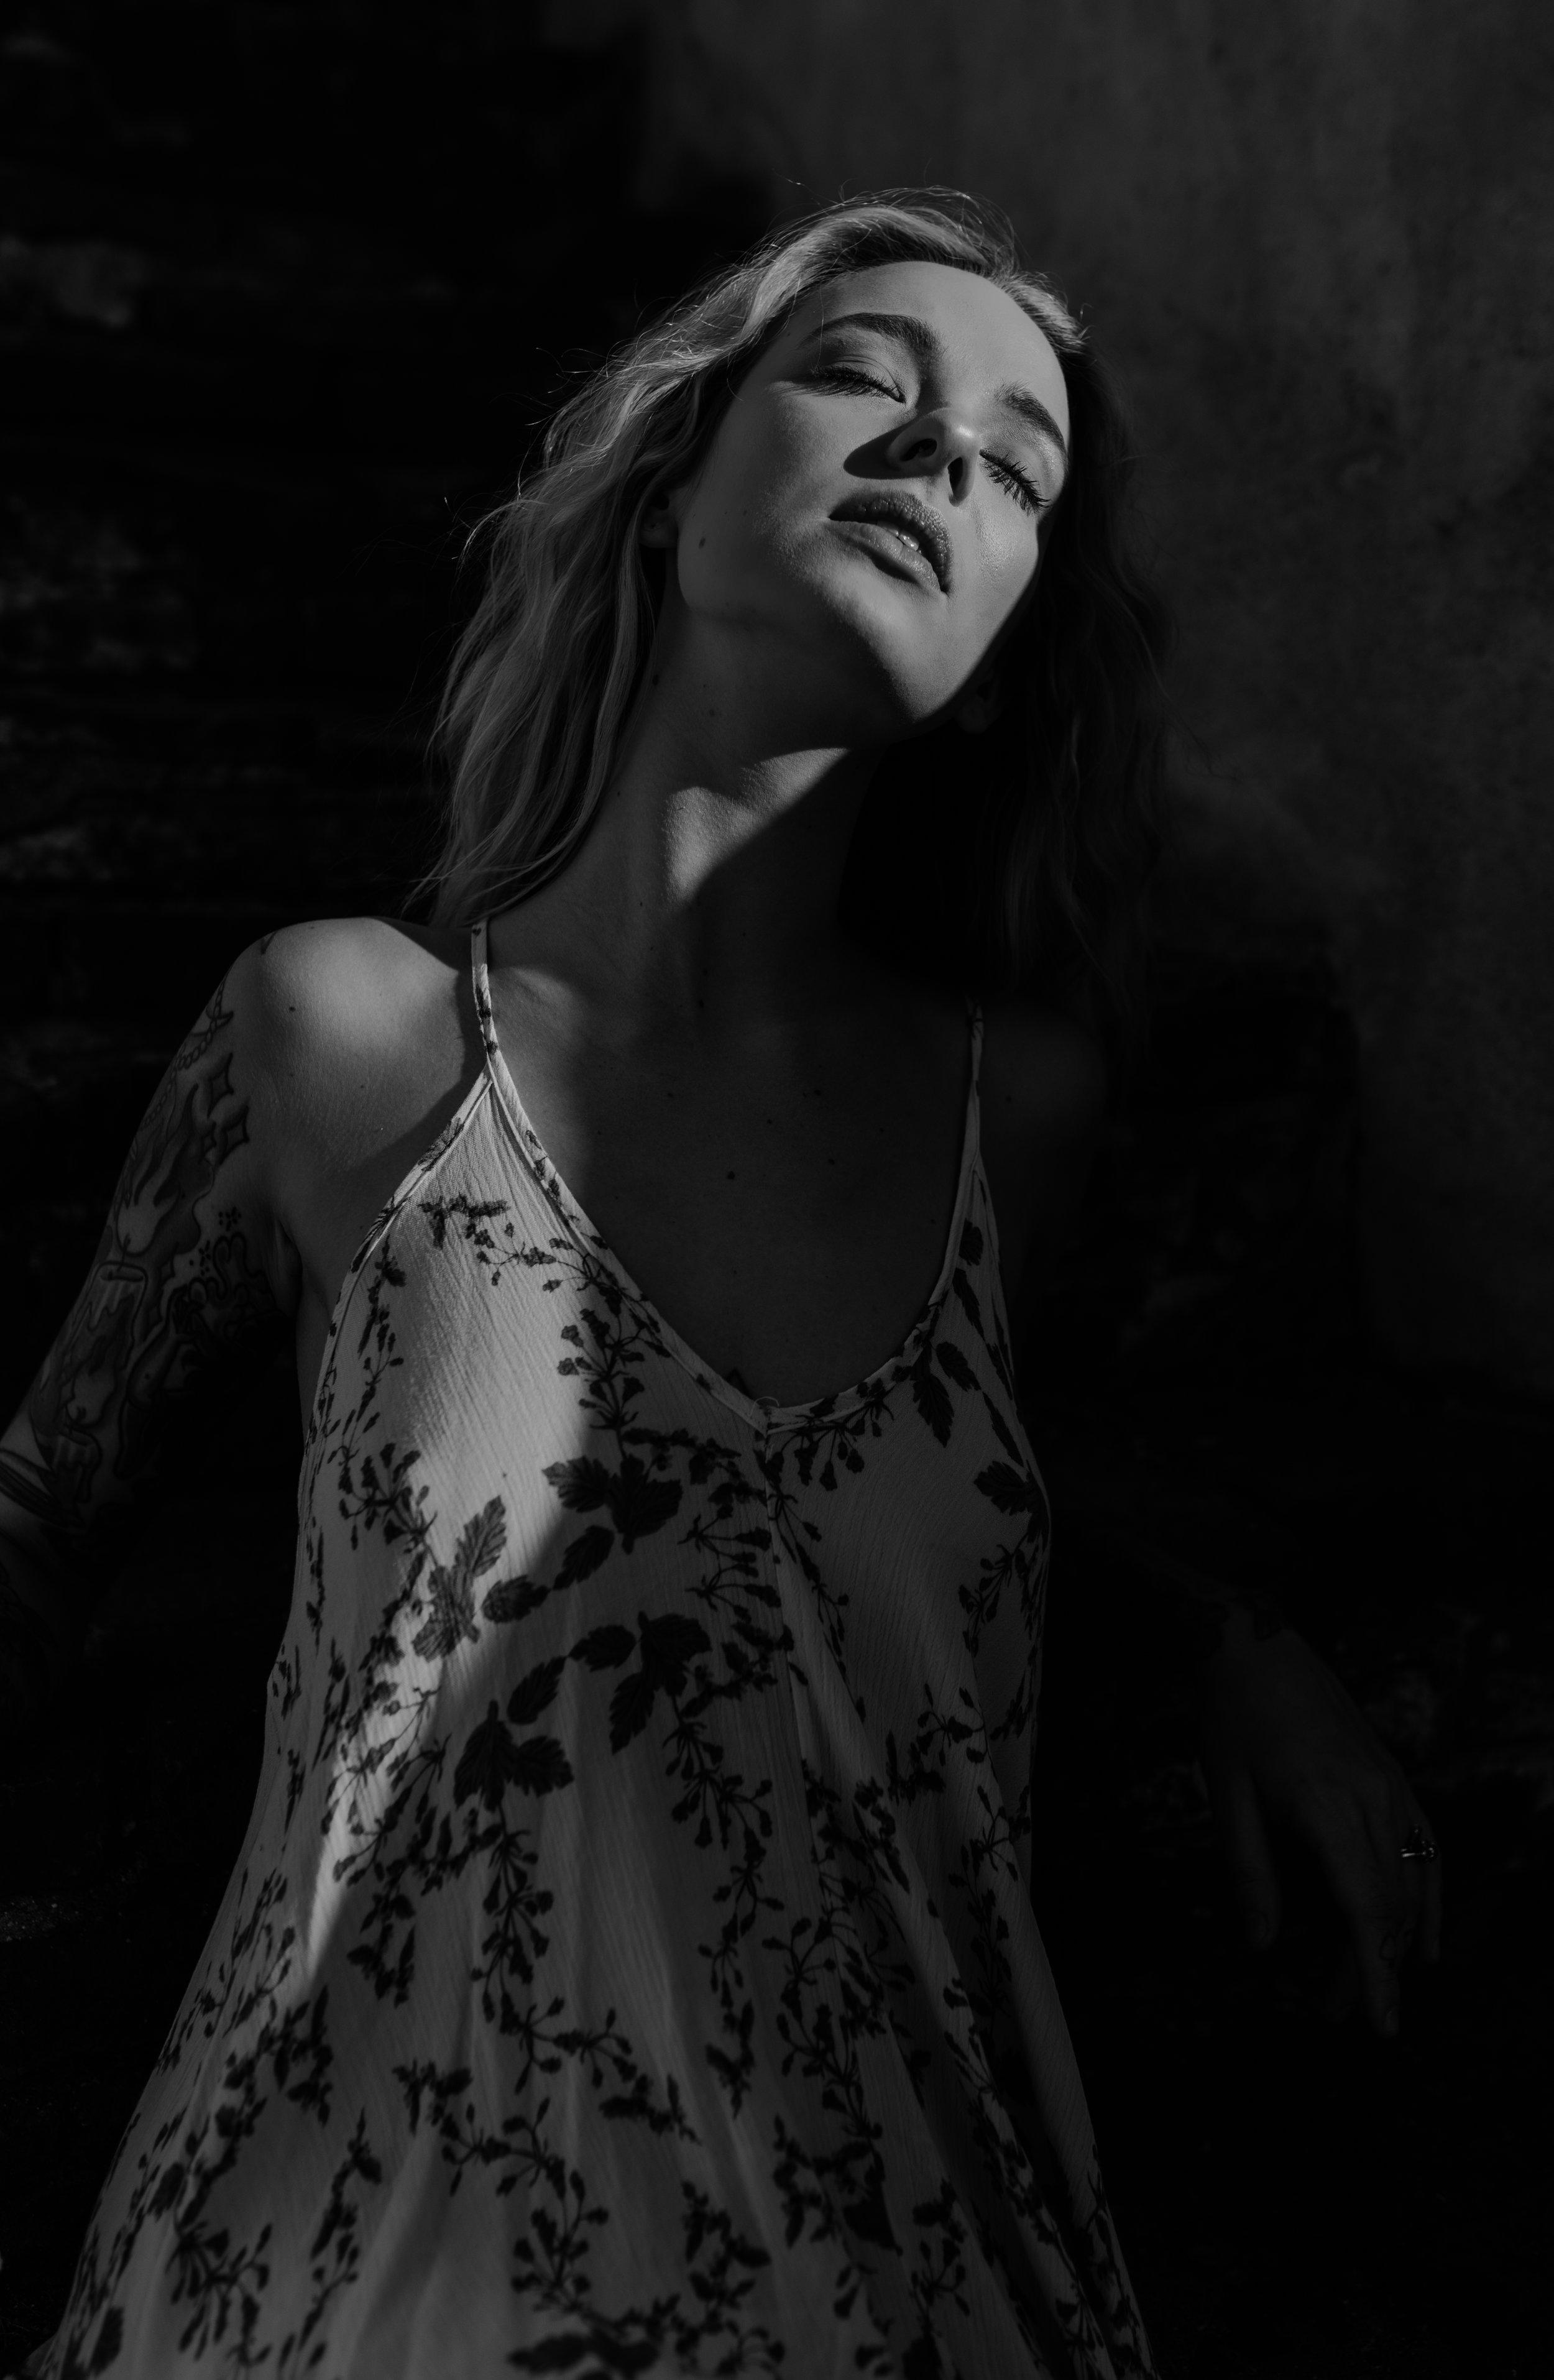 Matison Card (model), Christian Acosta (photographer), Krysta Morehouse (makeup)